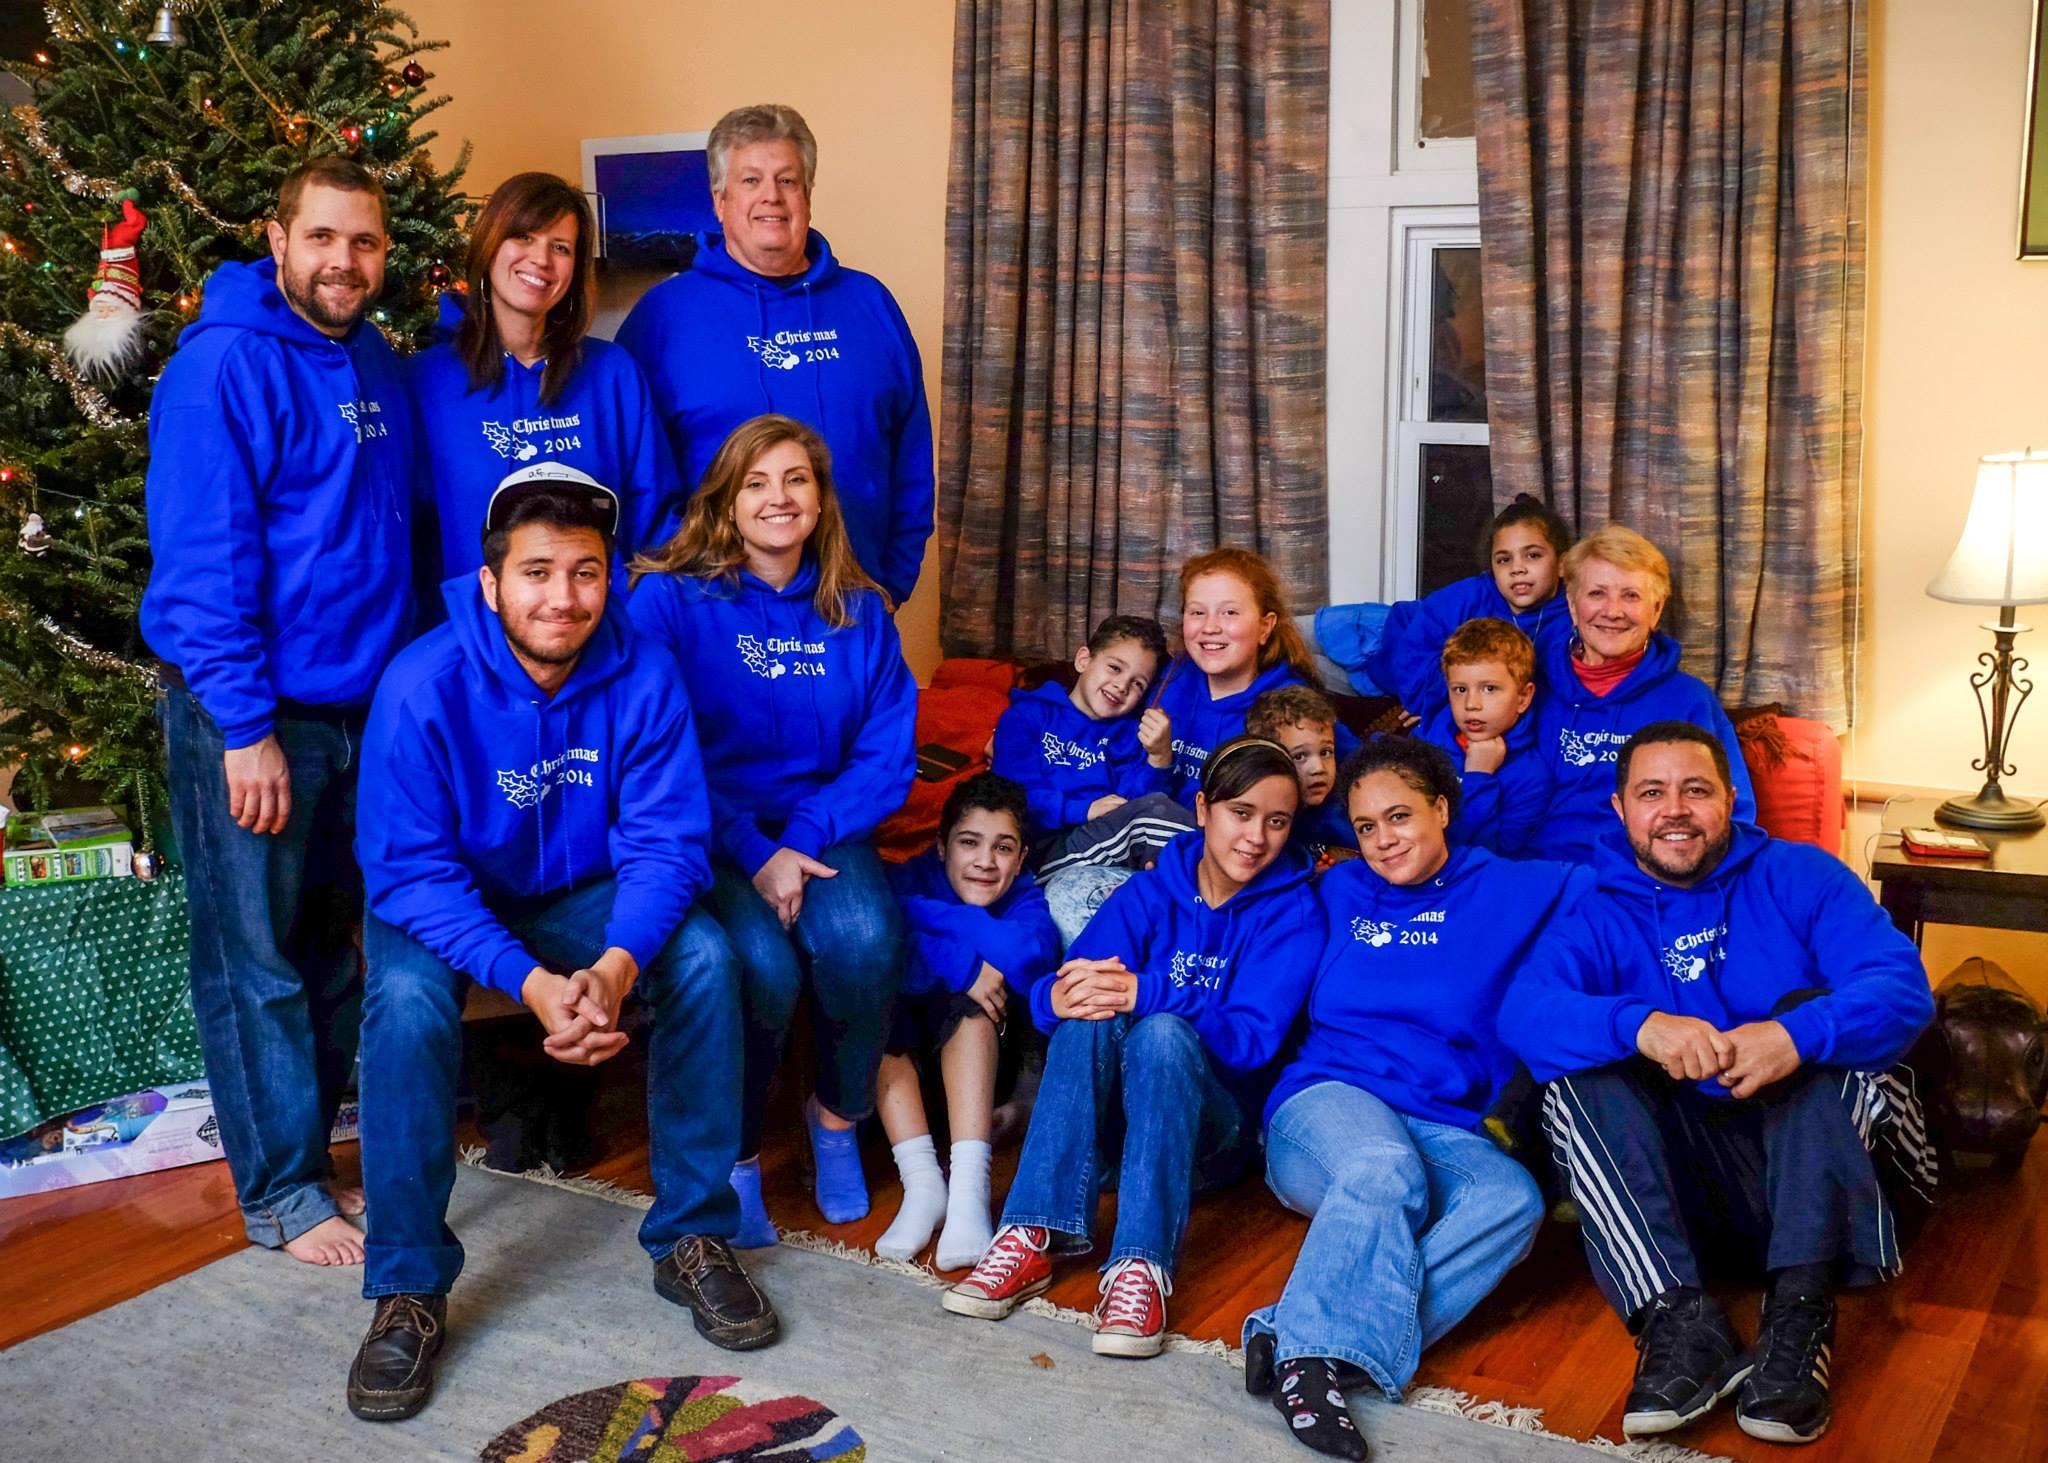 Custom T Shirts For Family Christmas Hoodies Shirt Design Ideas